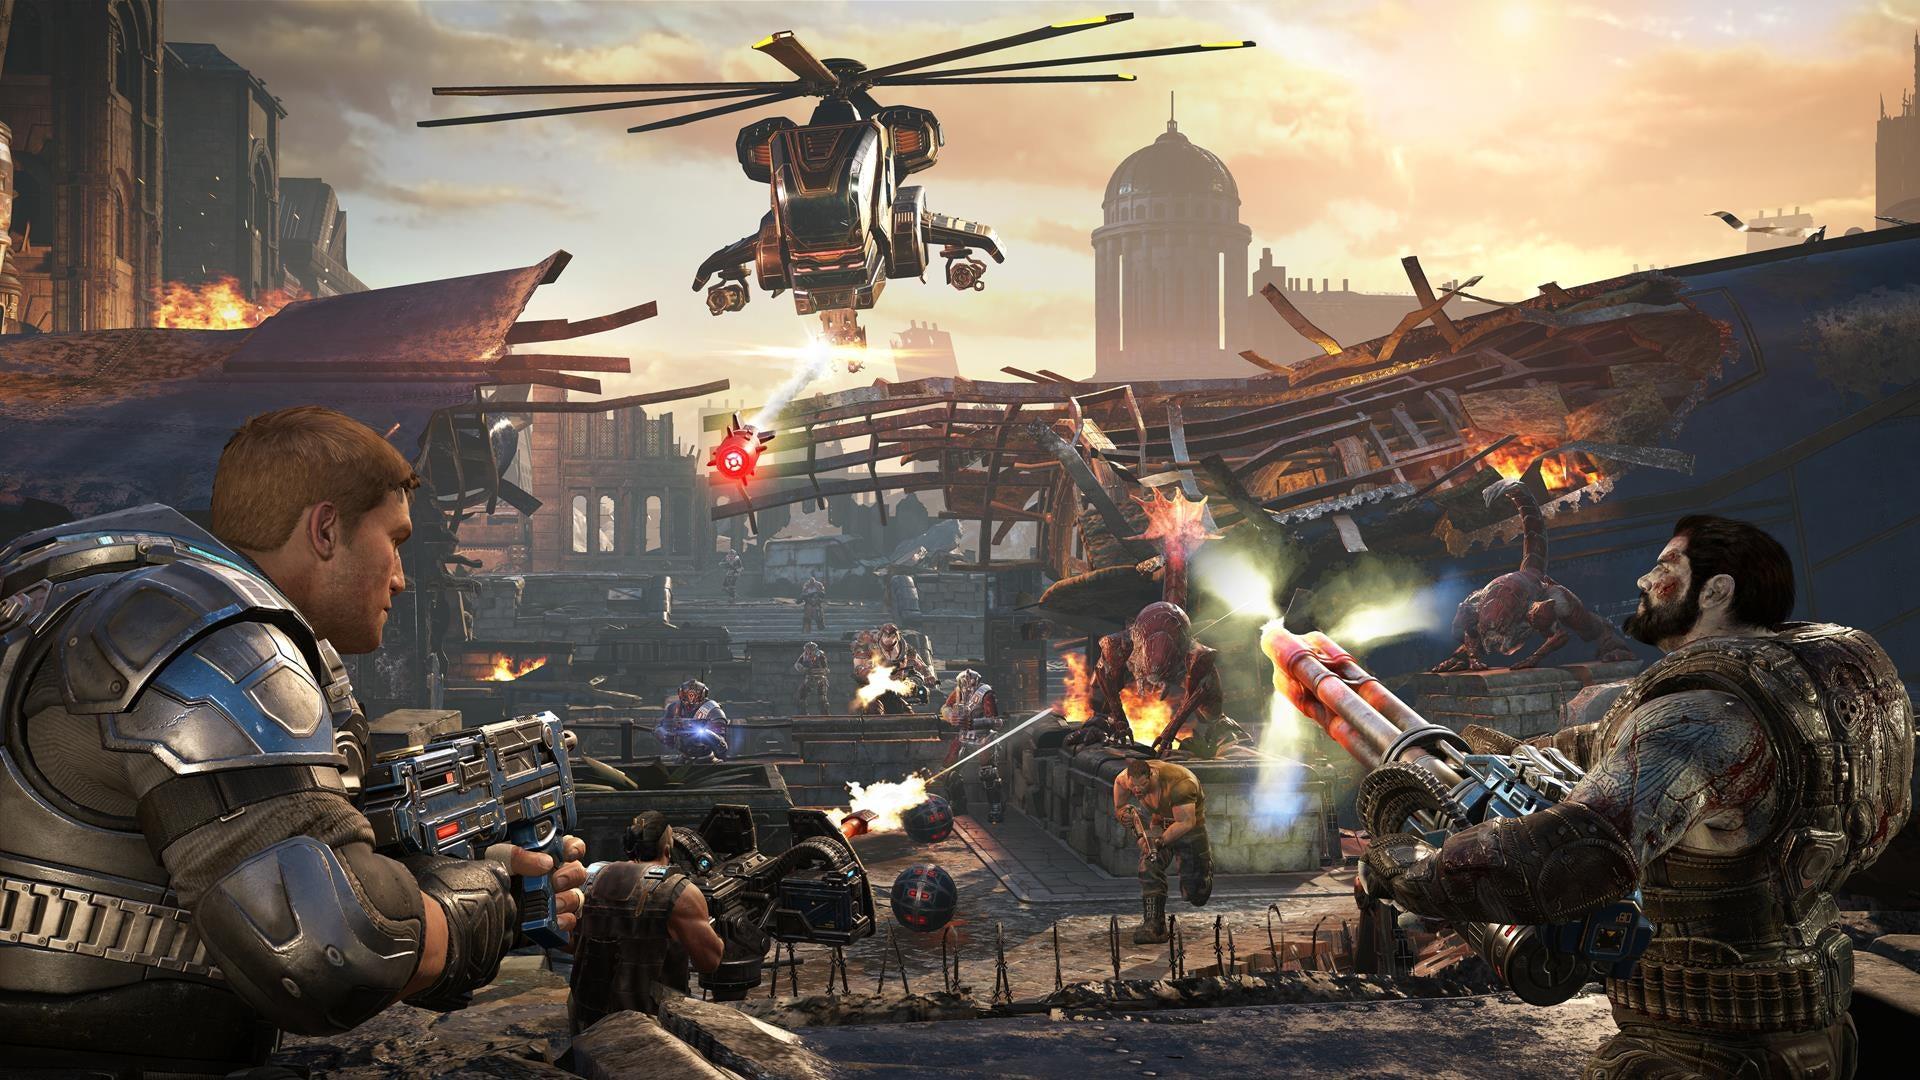 Image for Gears of War 4: Nine essential beginner's tips for Horde mode